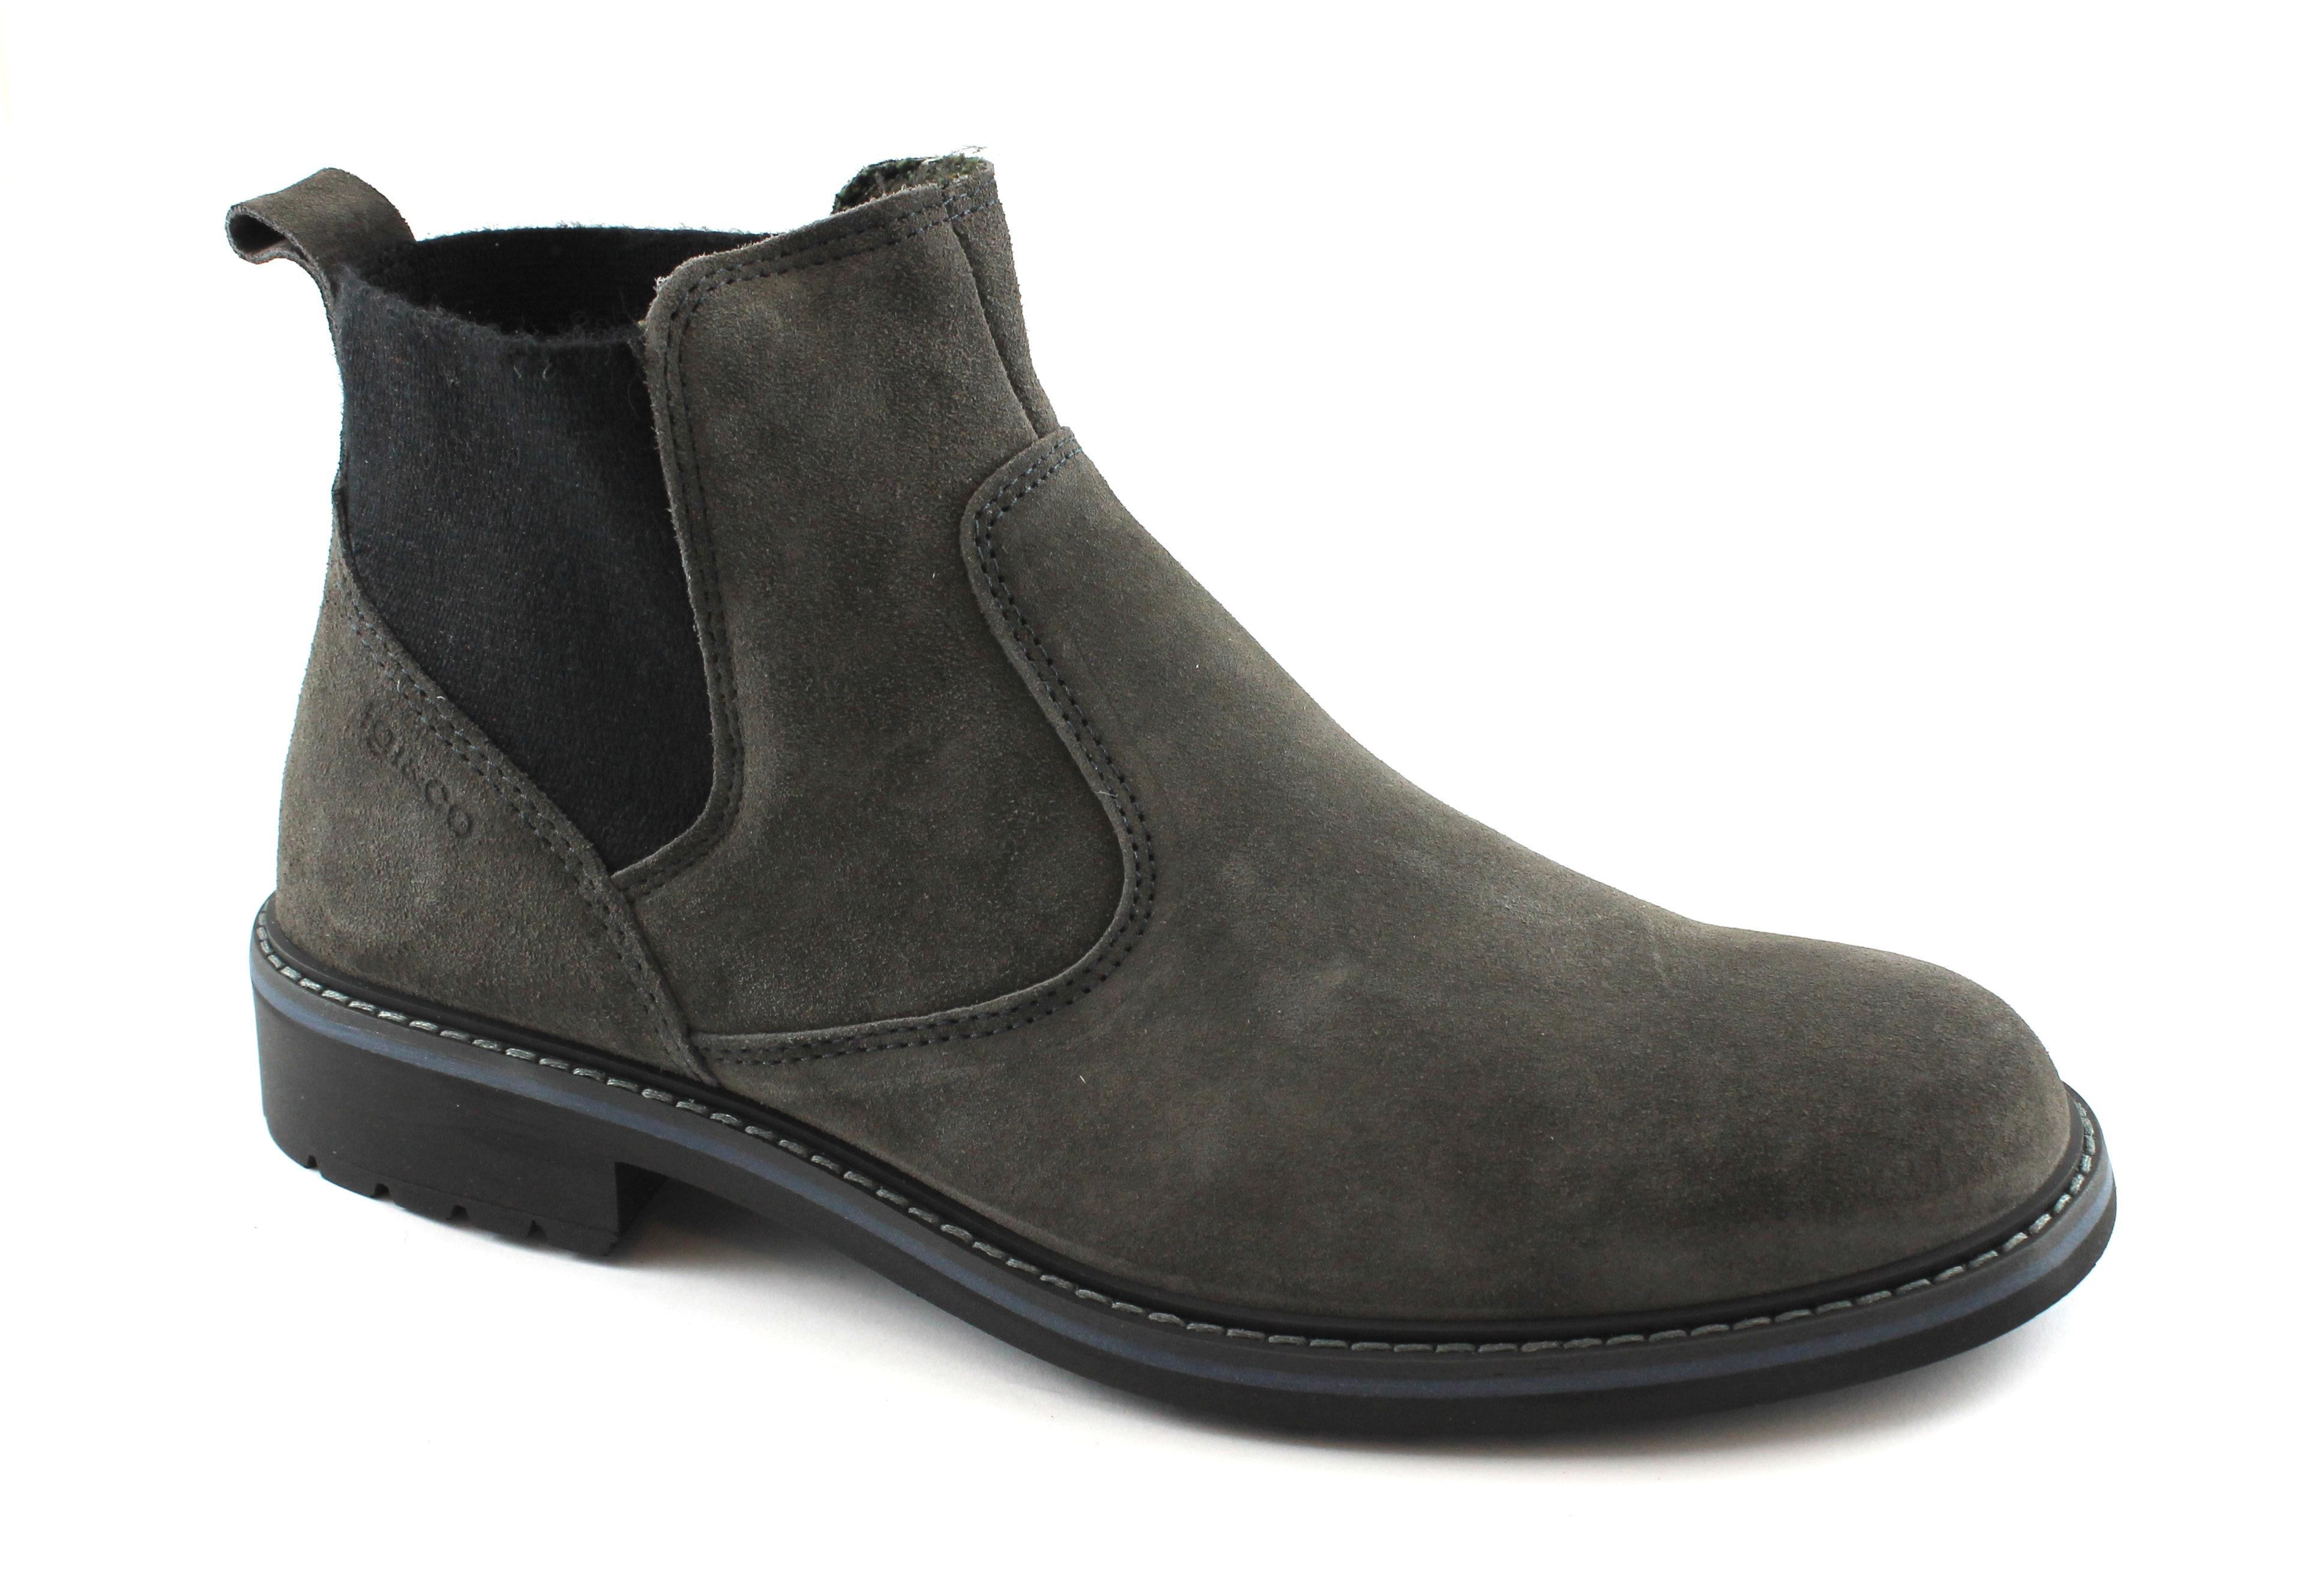 IGI&CO 87241 antracite grigio scarpe uomo stivaletti beatles camoscio